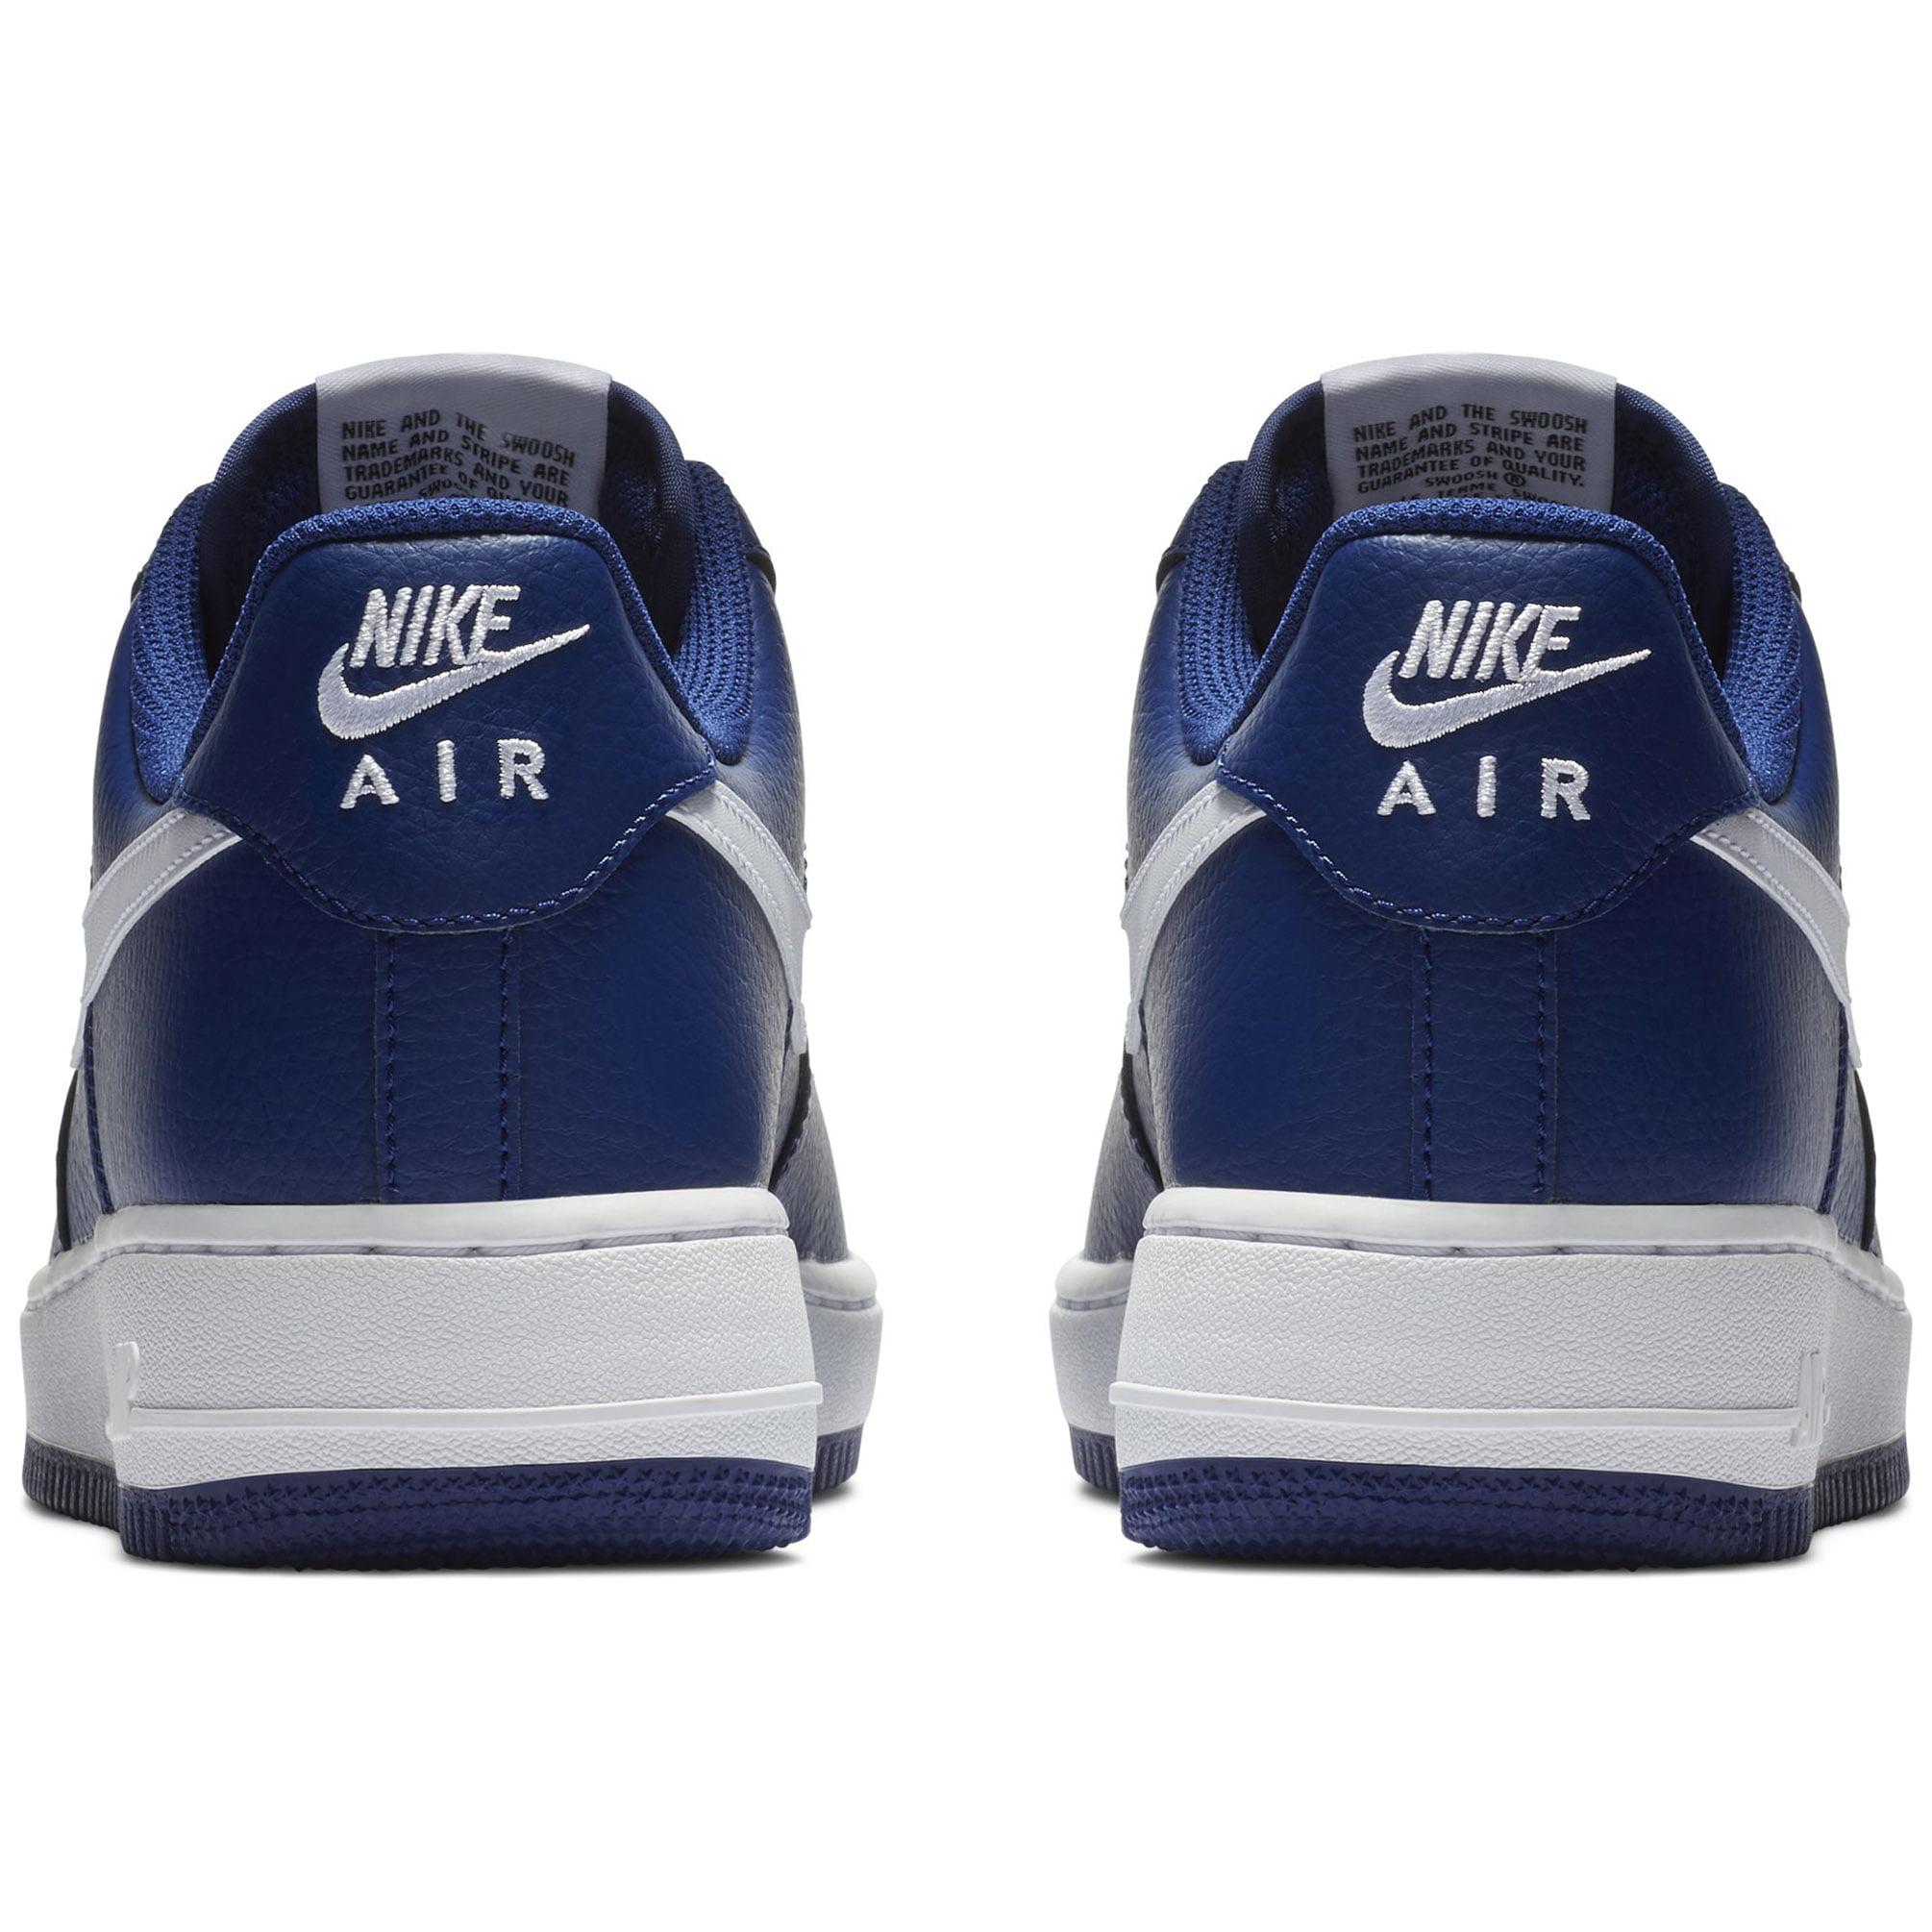 Nike Men's Air Force 1 Basketball Shoe Deep Royal Blue/White-White 12